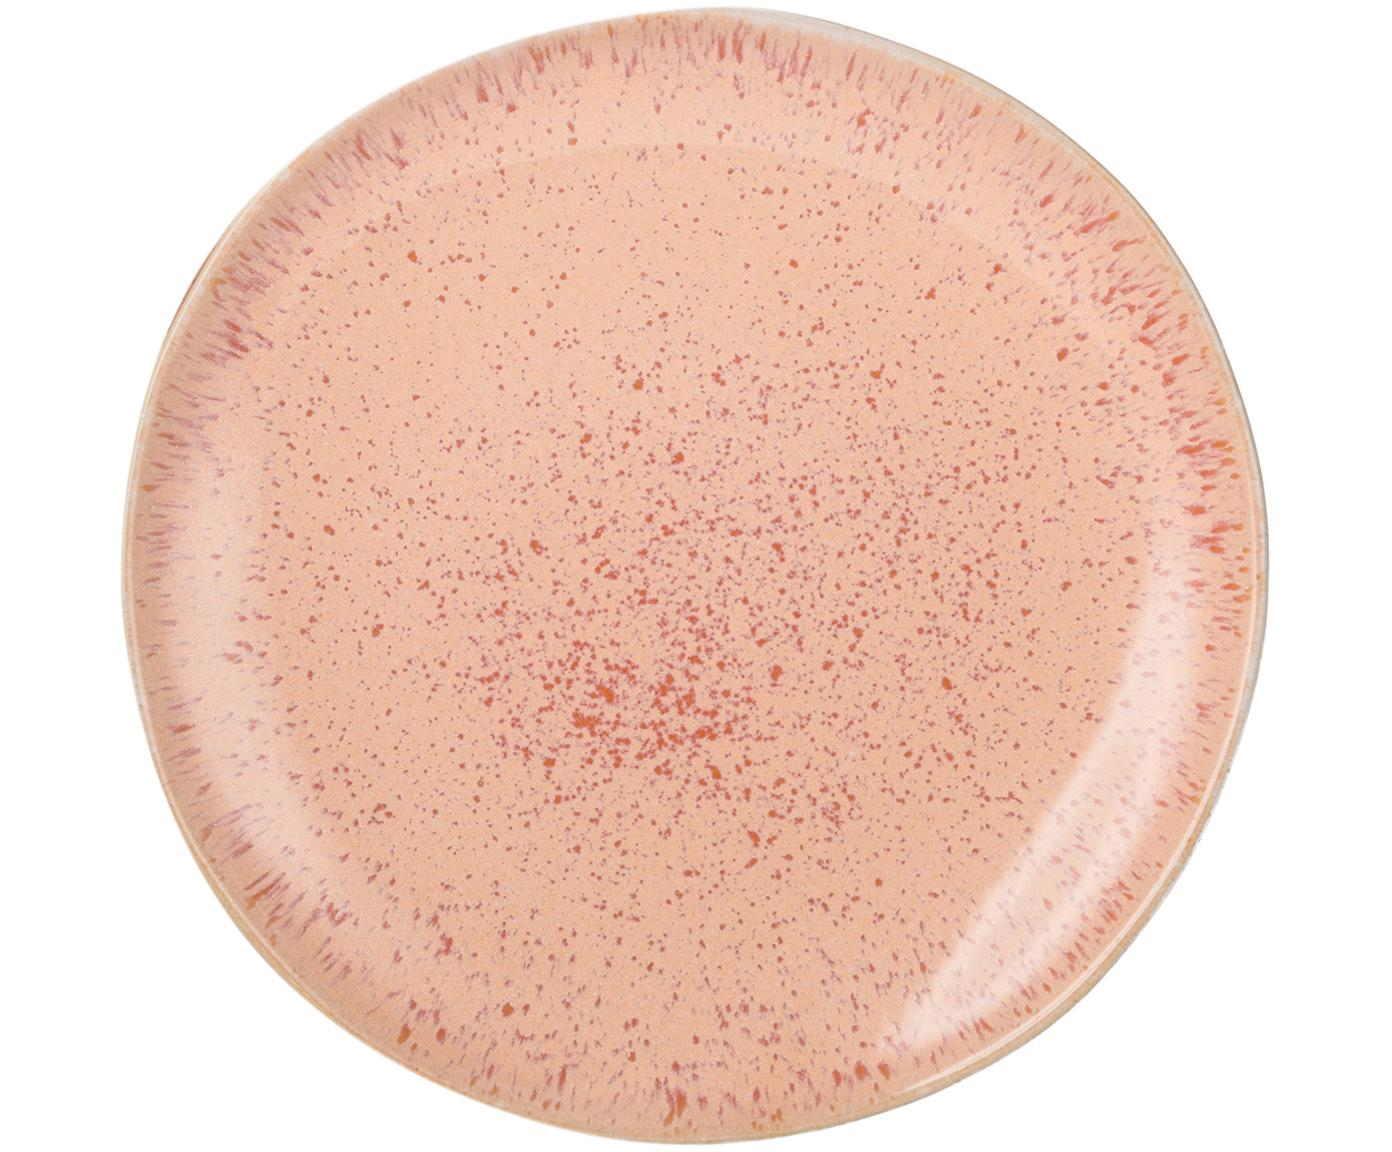 Piattino da dessert dipinto a mano Areia 2 pz, Terracotta, Tonalità rosse, bianco latteo, beige chiaro, Ø 22 cm